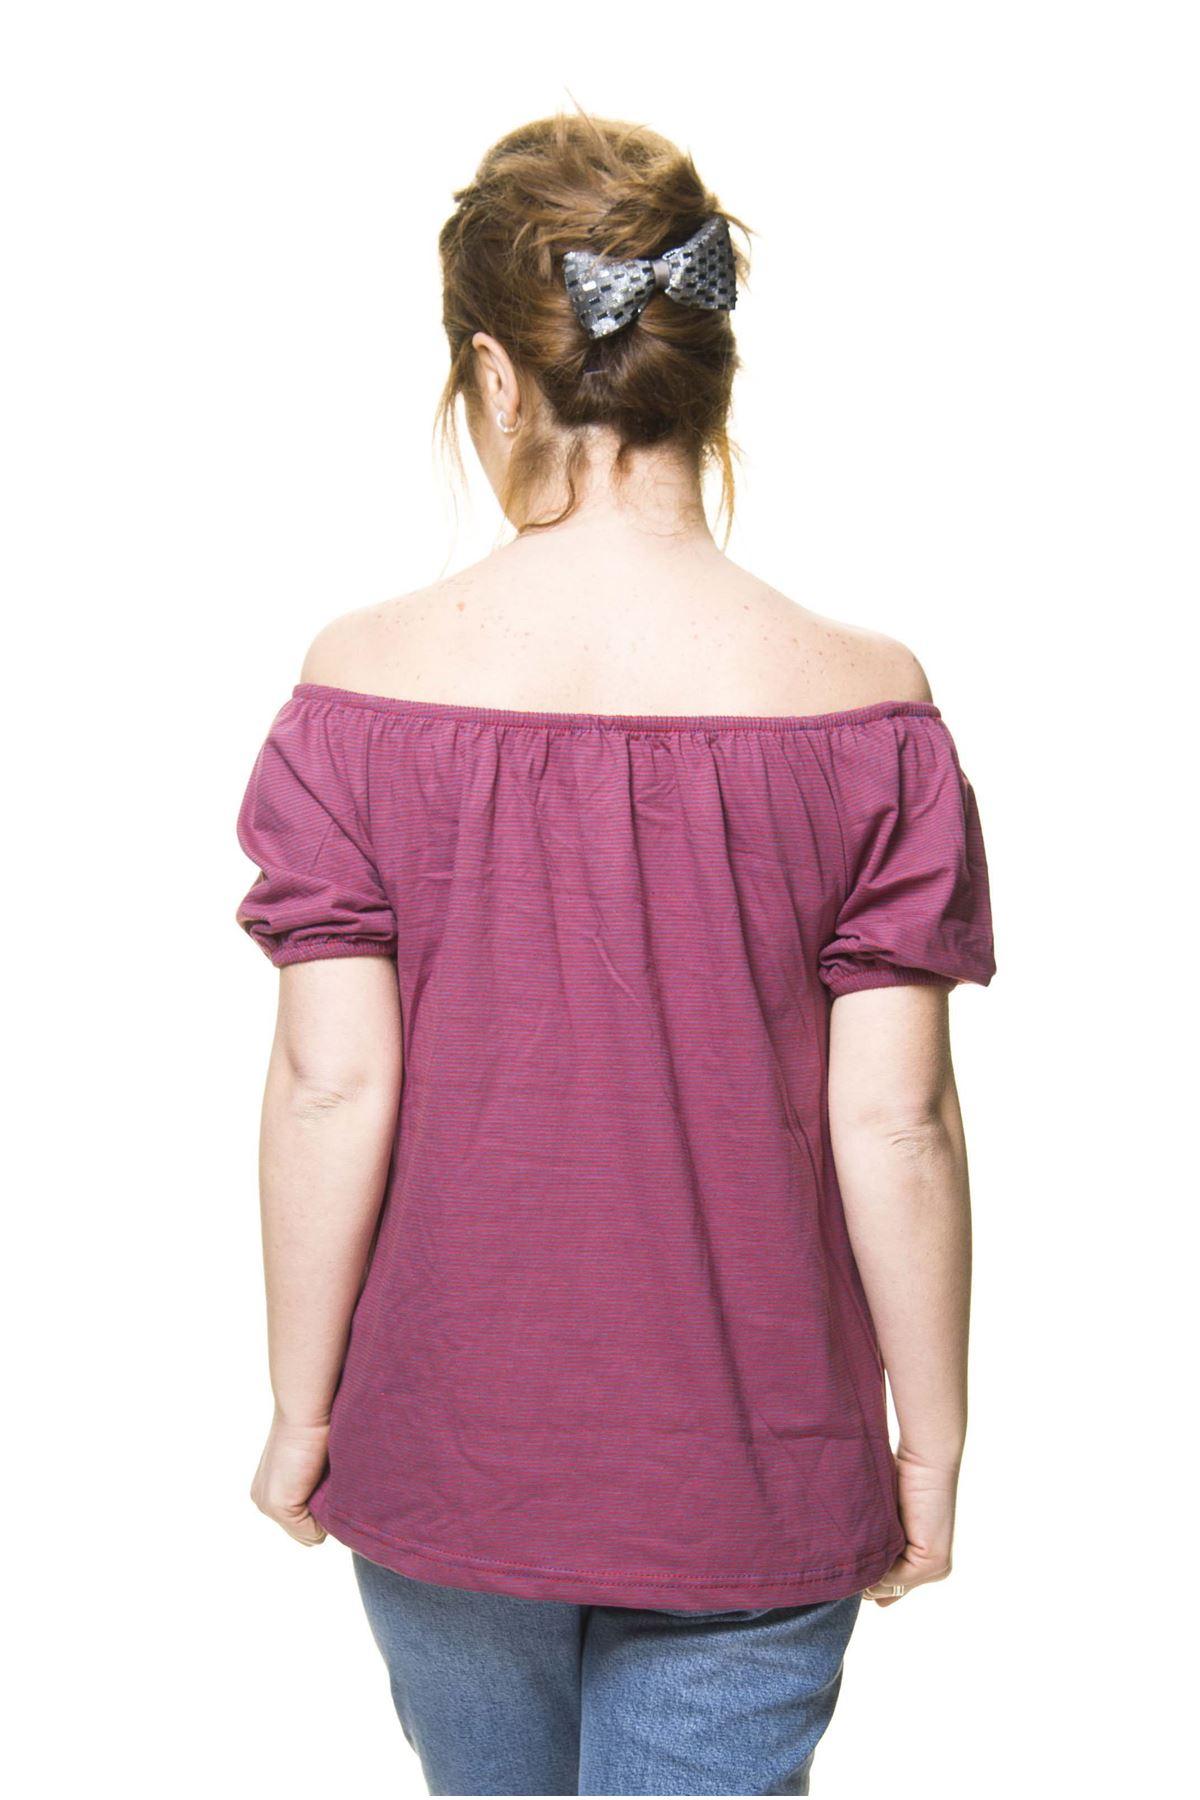 Kadın Mürdüm Pamuklu Penye Bluz 5D-30441